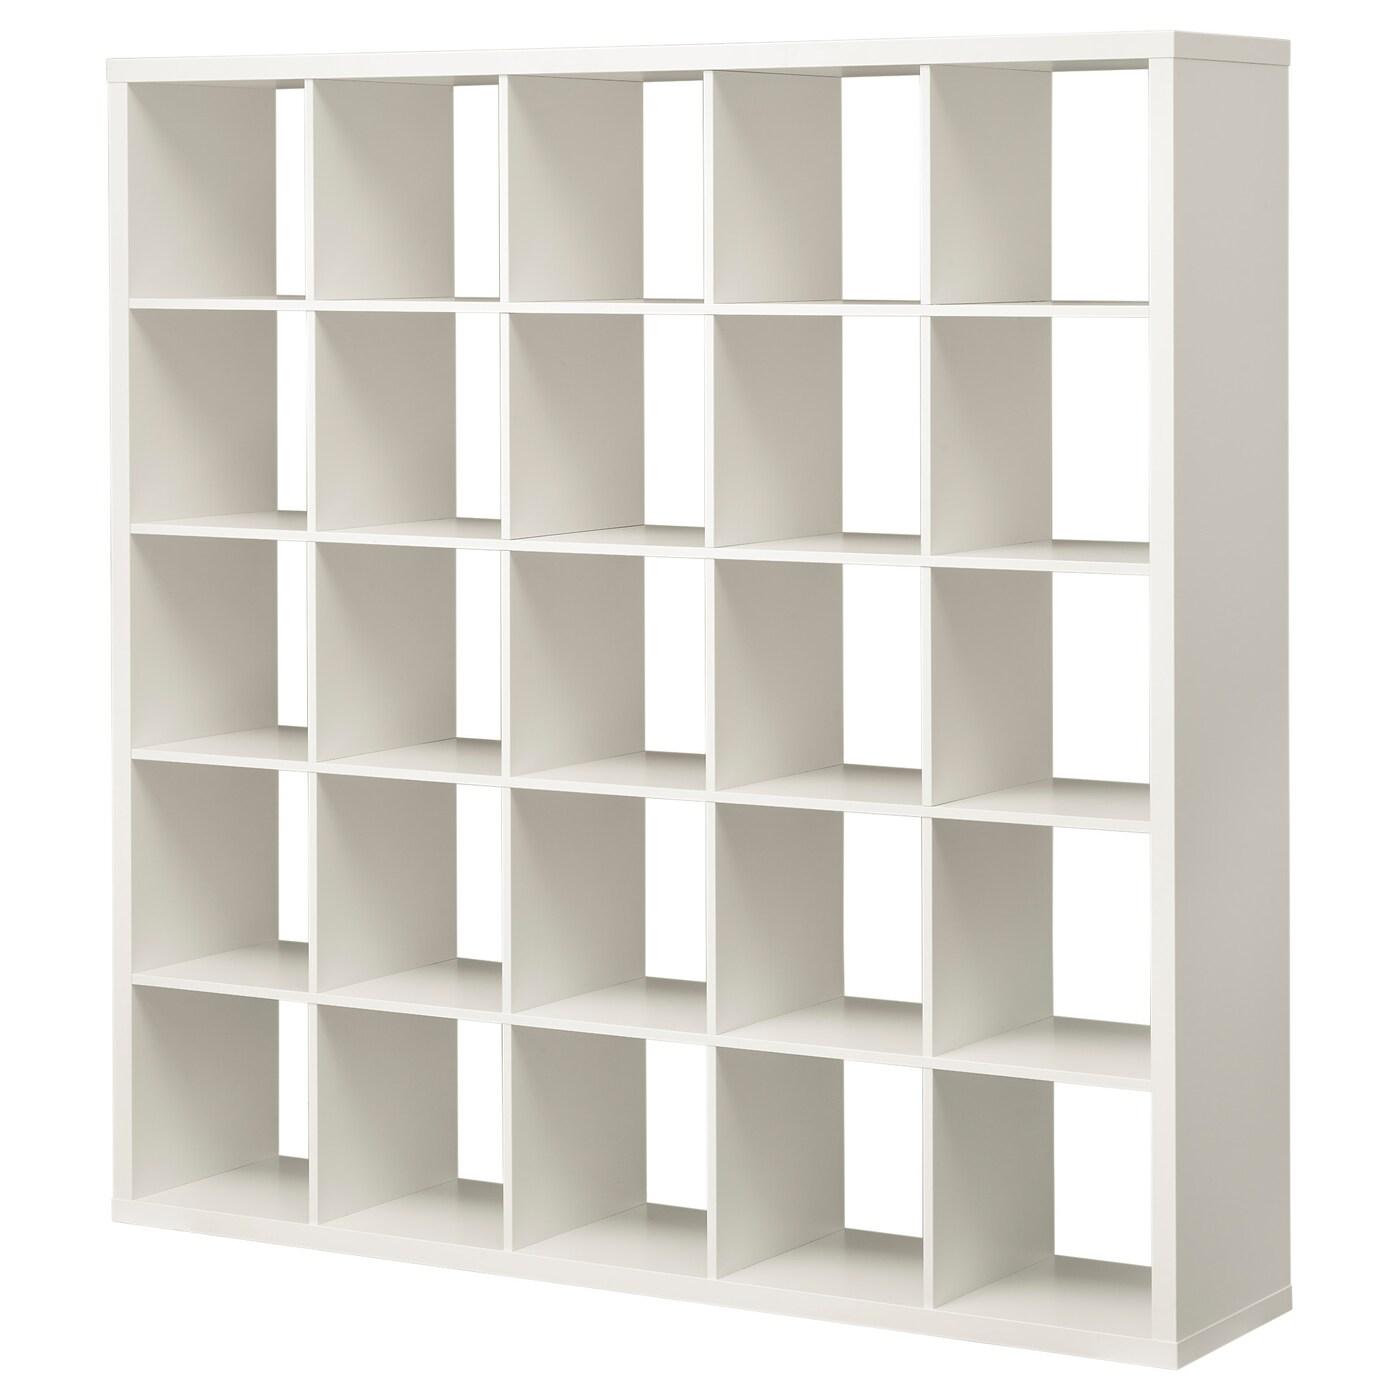 kallax shelving unit white 182x182 cm ikea. Black Bedroom Furniture Sets. Home Design Ideas